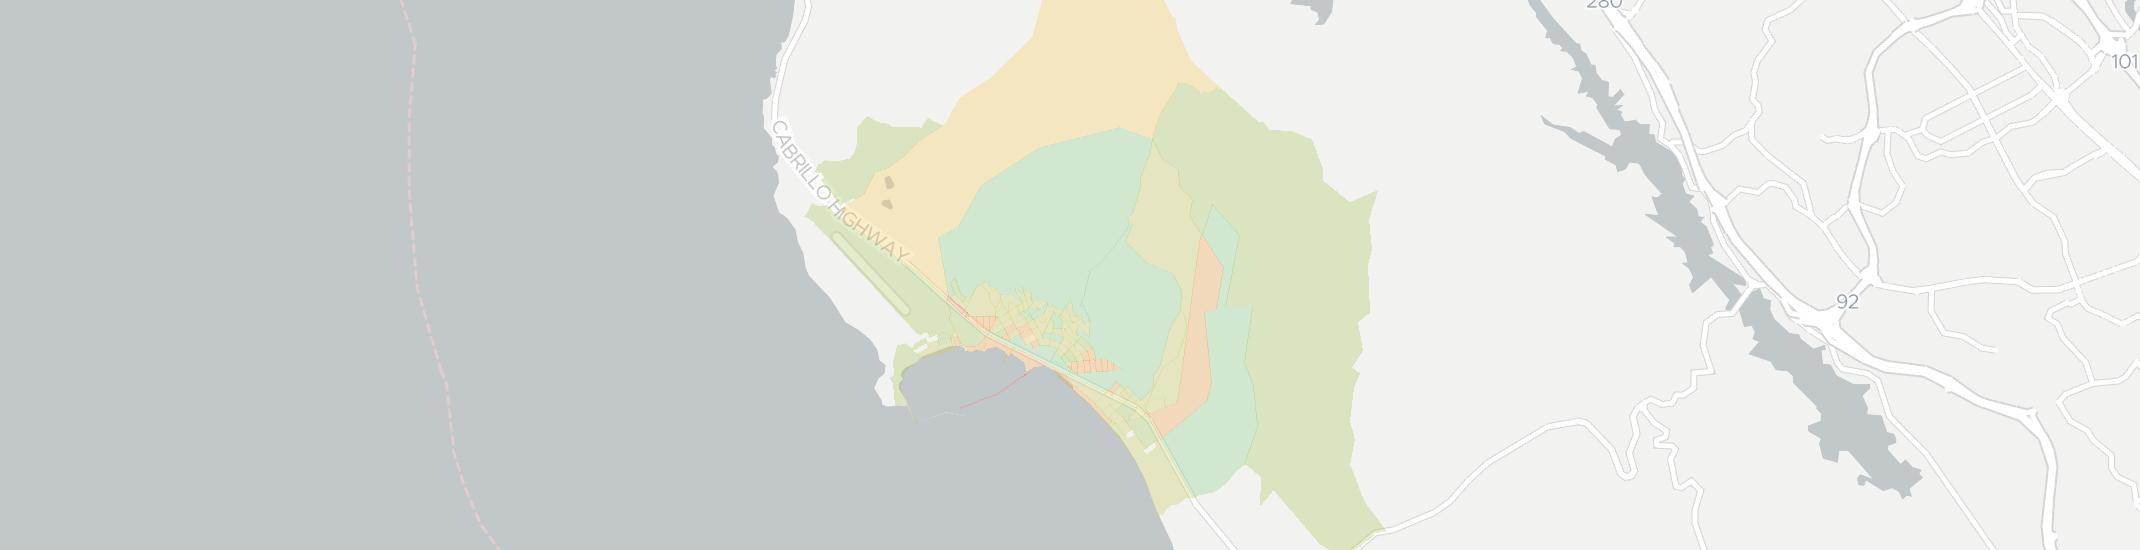 El Granada Internet Competition Map. Click for interactive map.